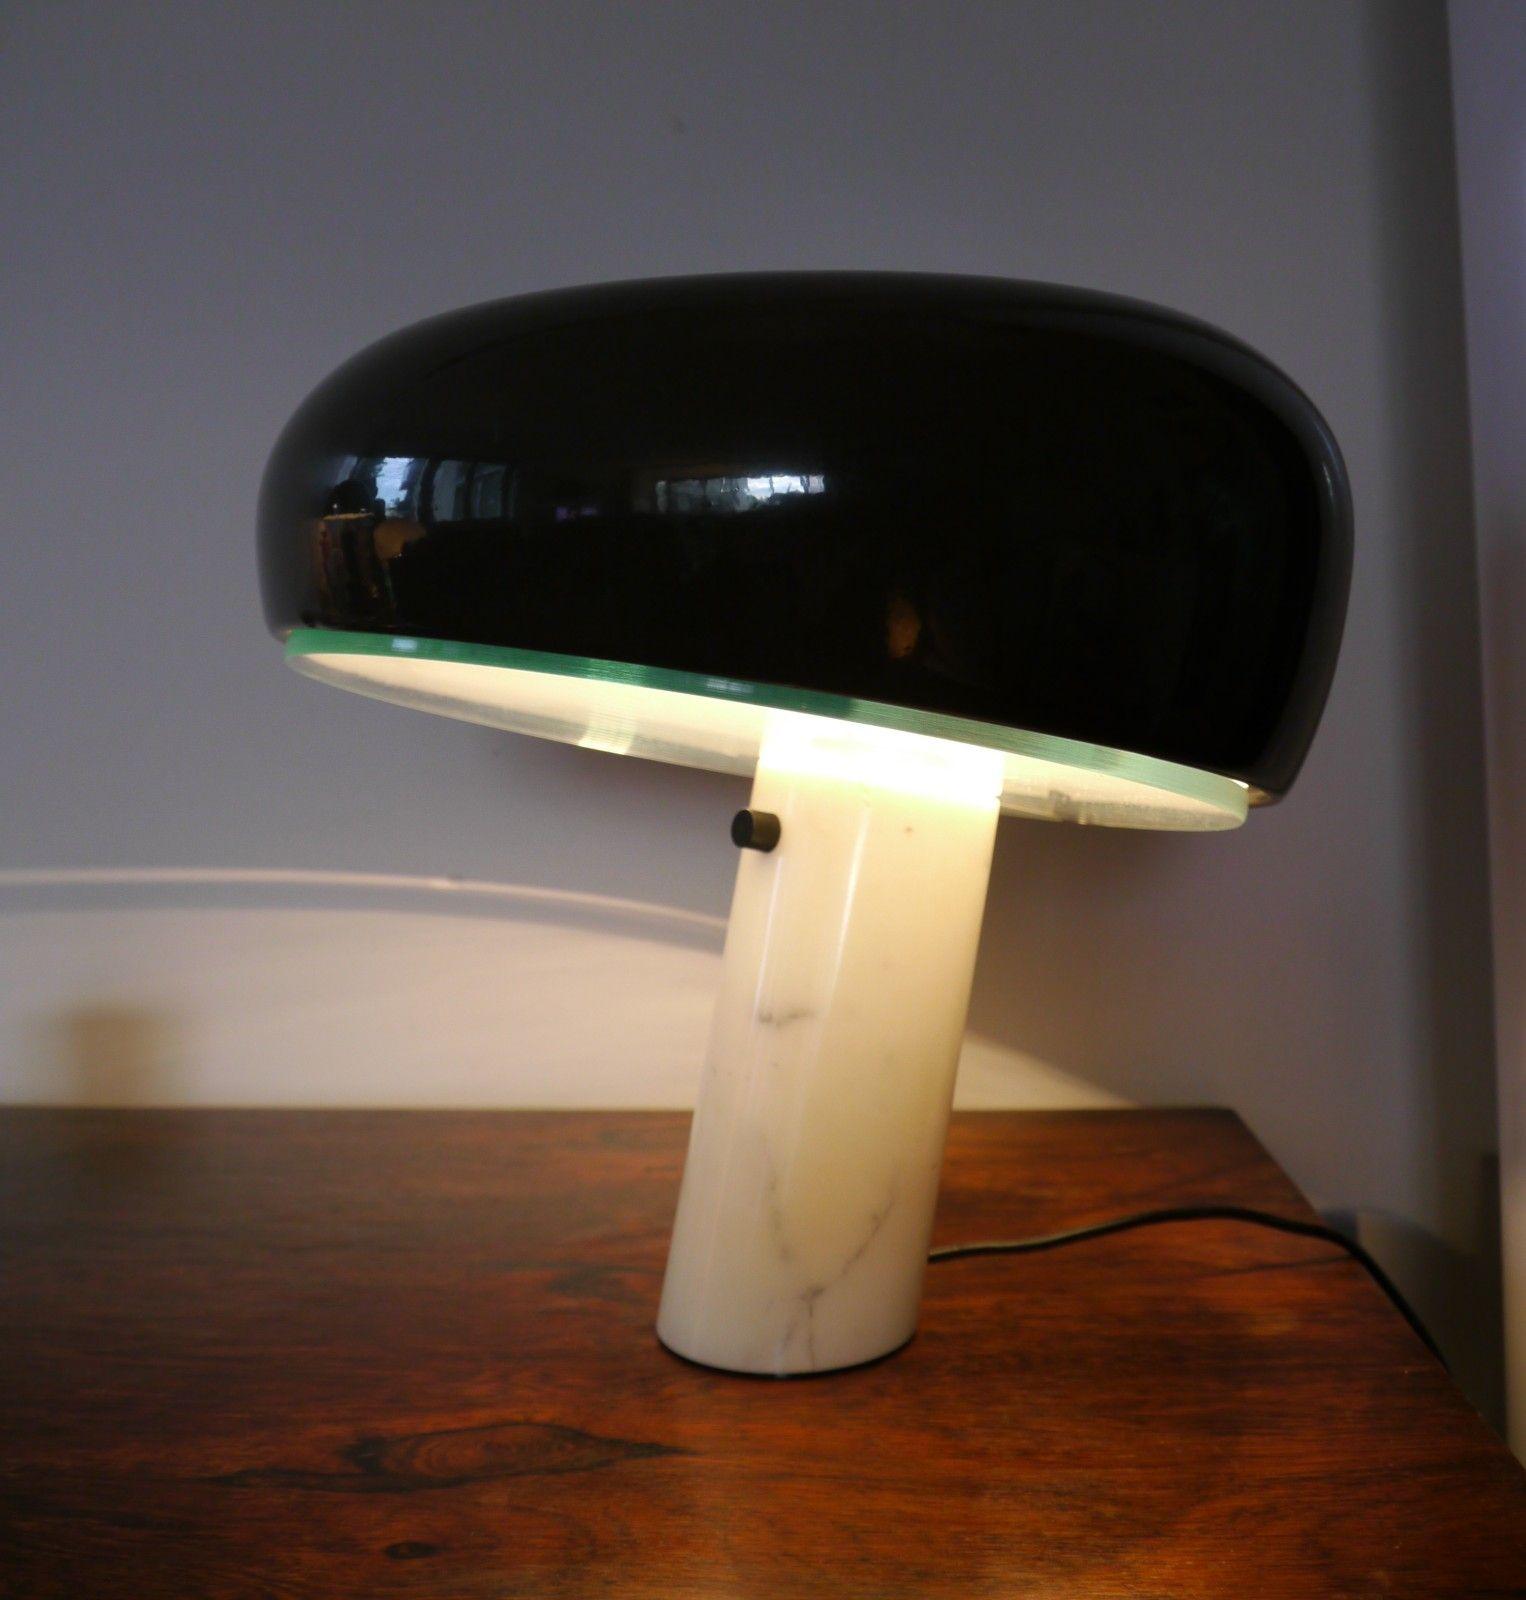 lampe snoopy achille castiglioni pier giacomo ed flos my wishlist pinterest lights. Black Bedroom Furniture Sets. Home Design Ideas